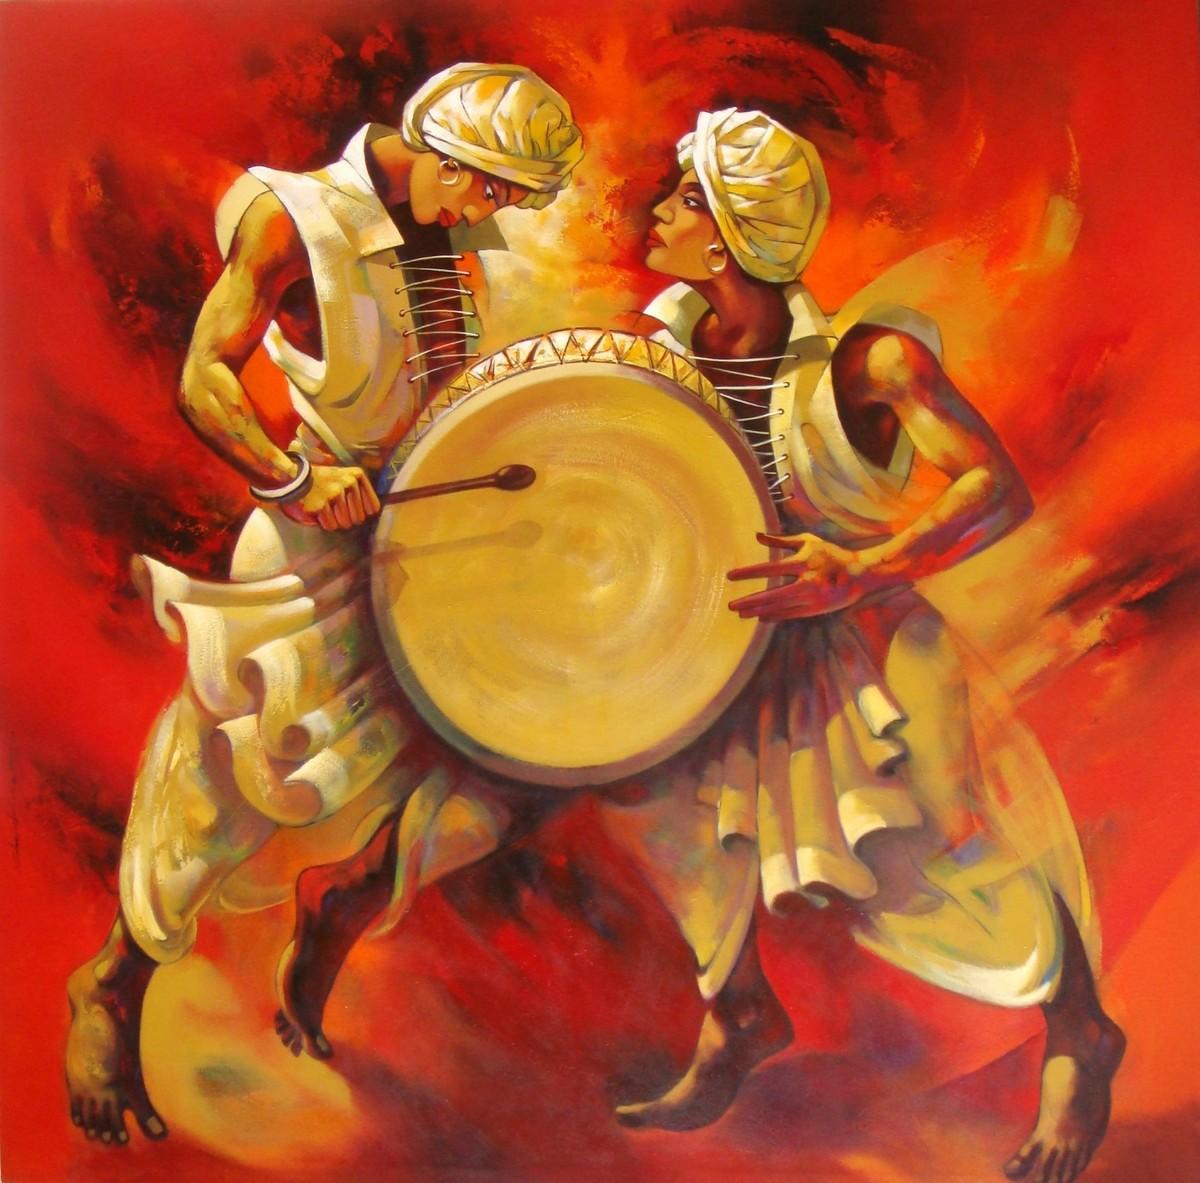 Musician by artist shankar gojare decorative painting mojarto 132299 - Decorative painting artists ...